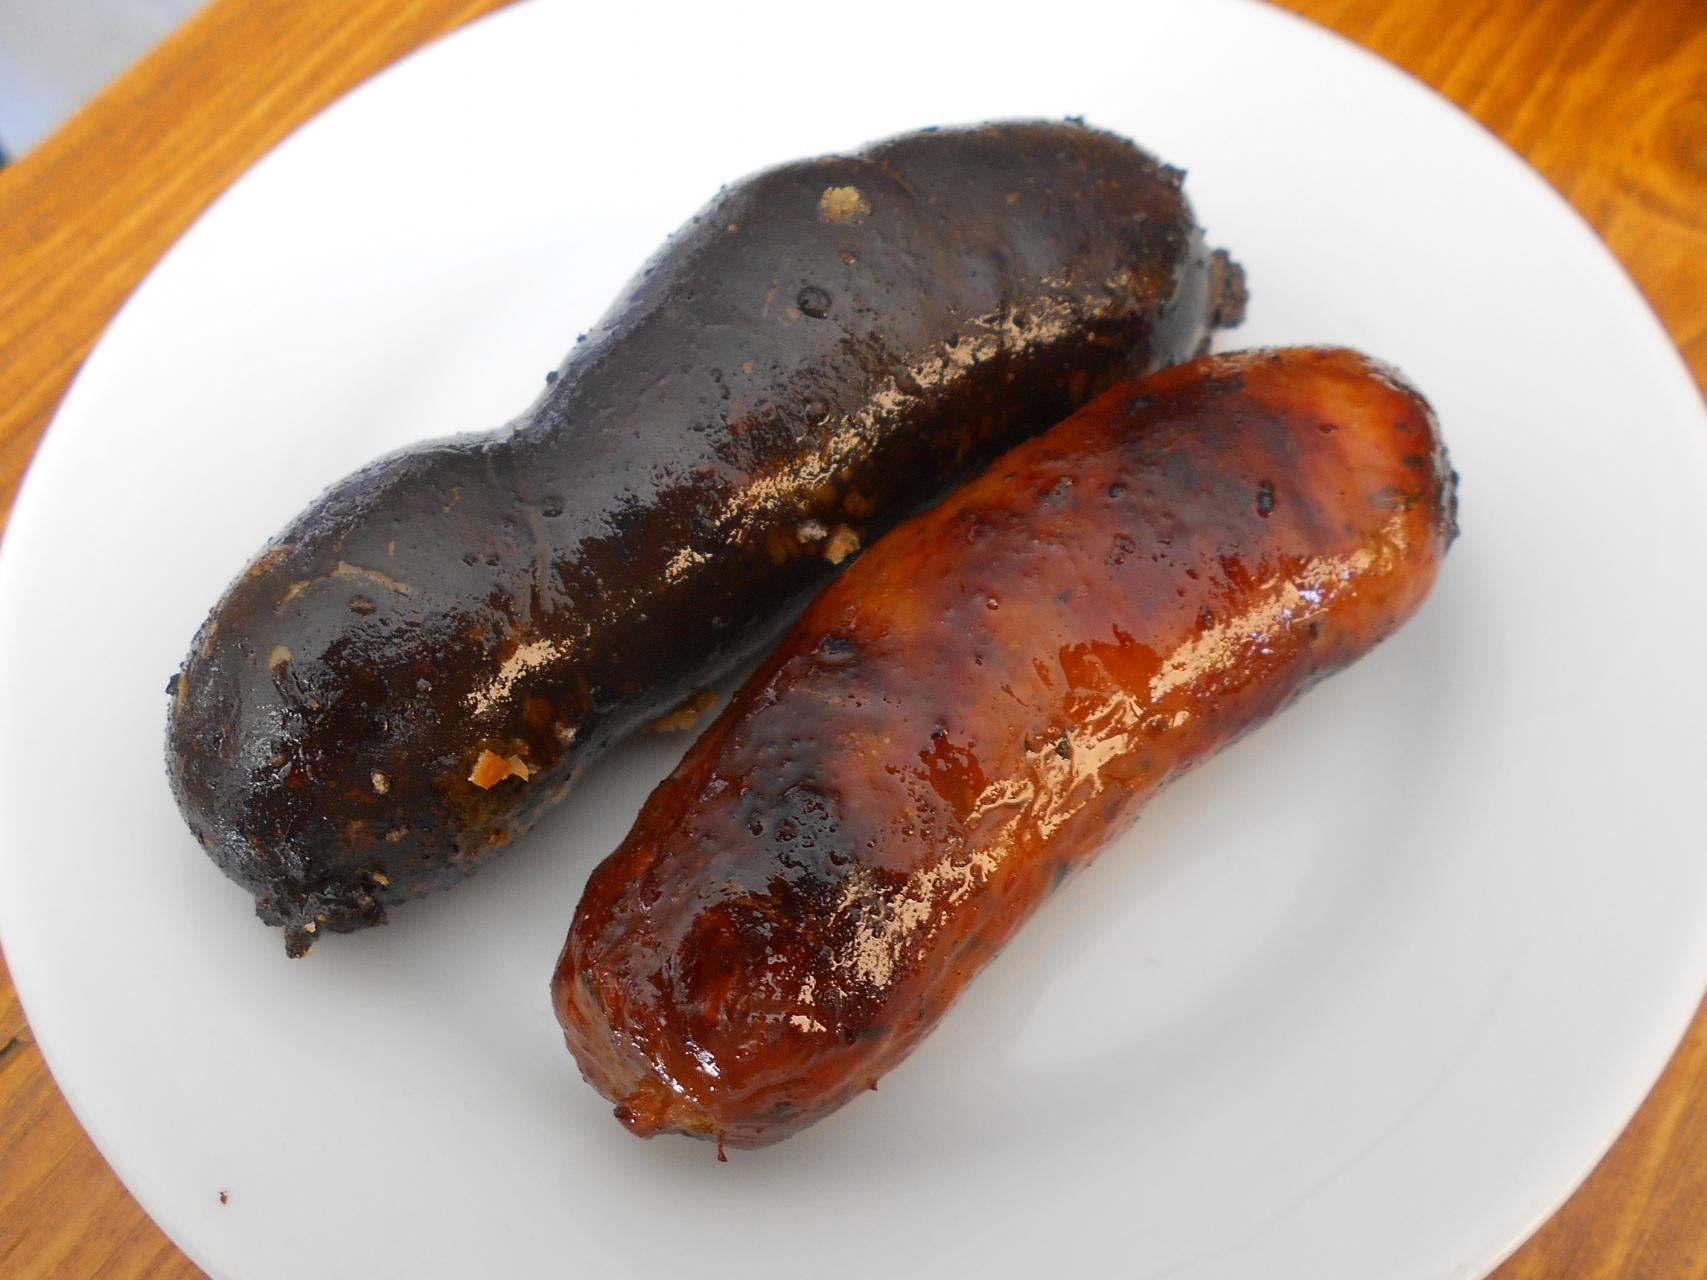 The black pudding and chorizo.